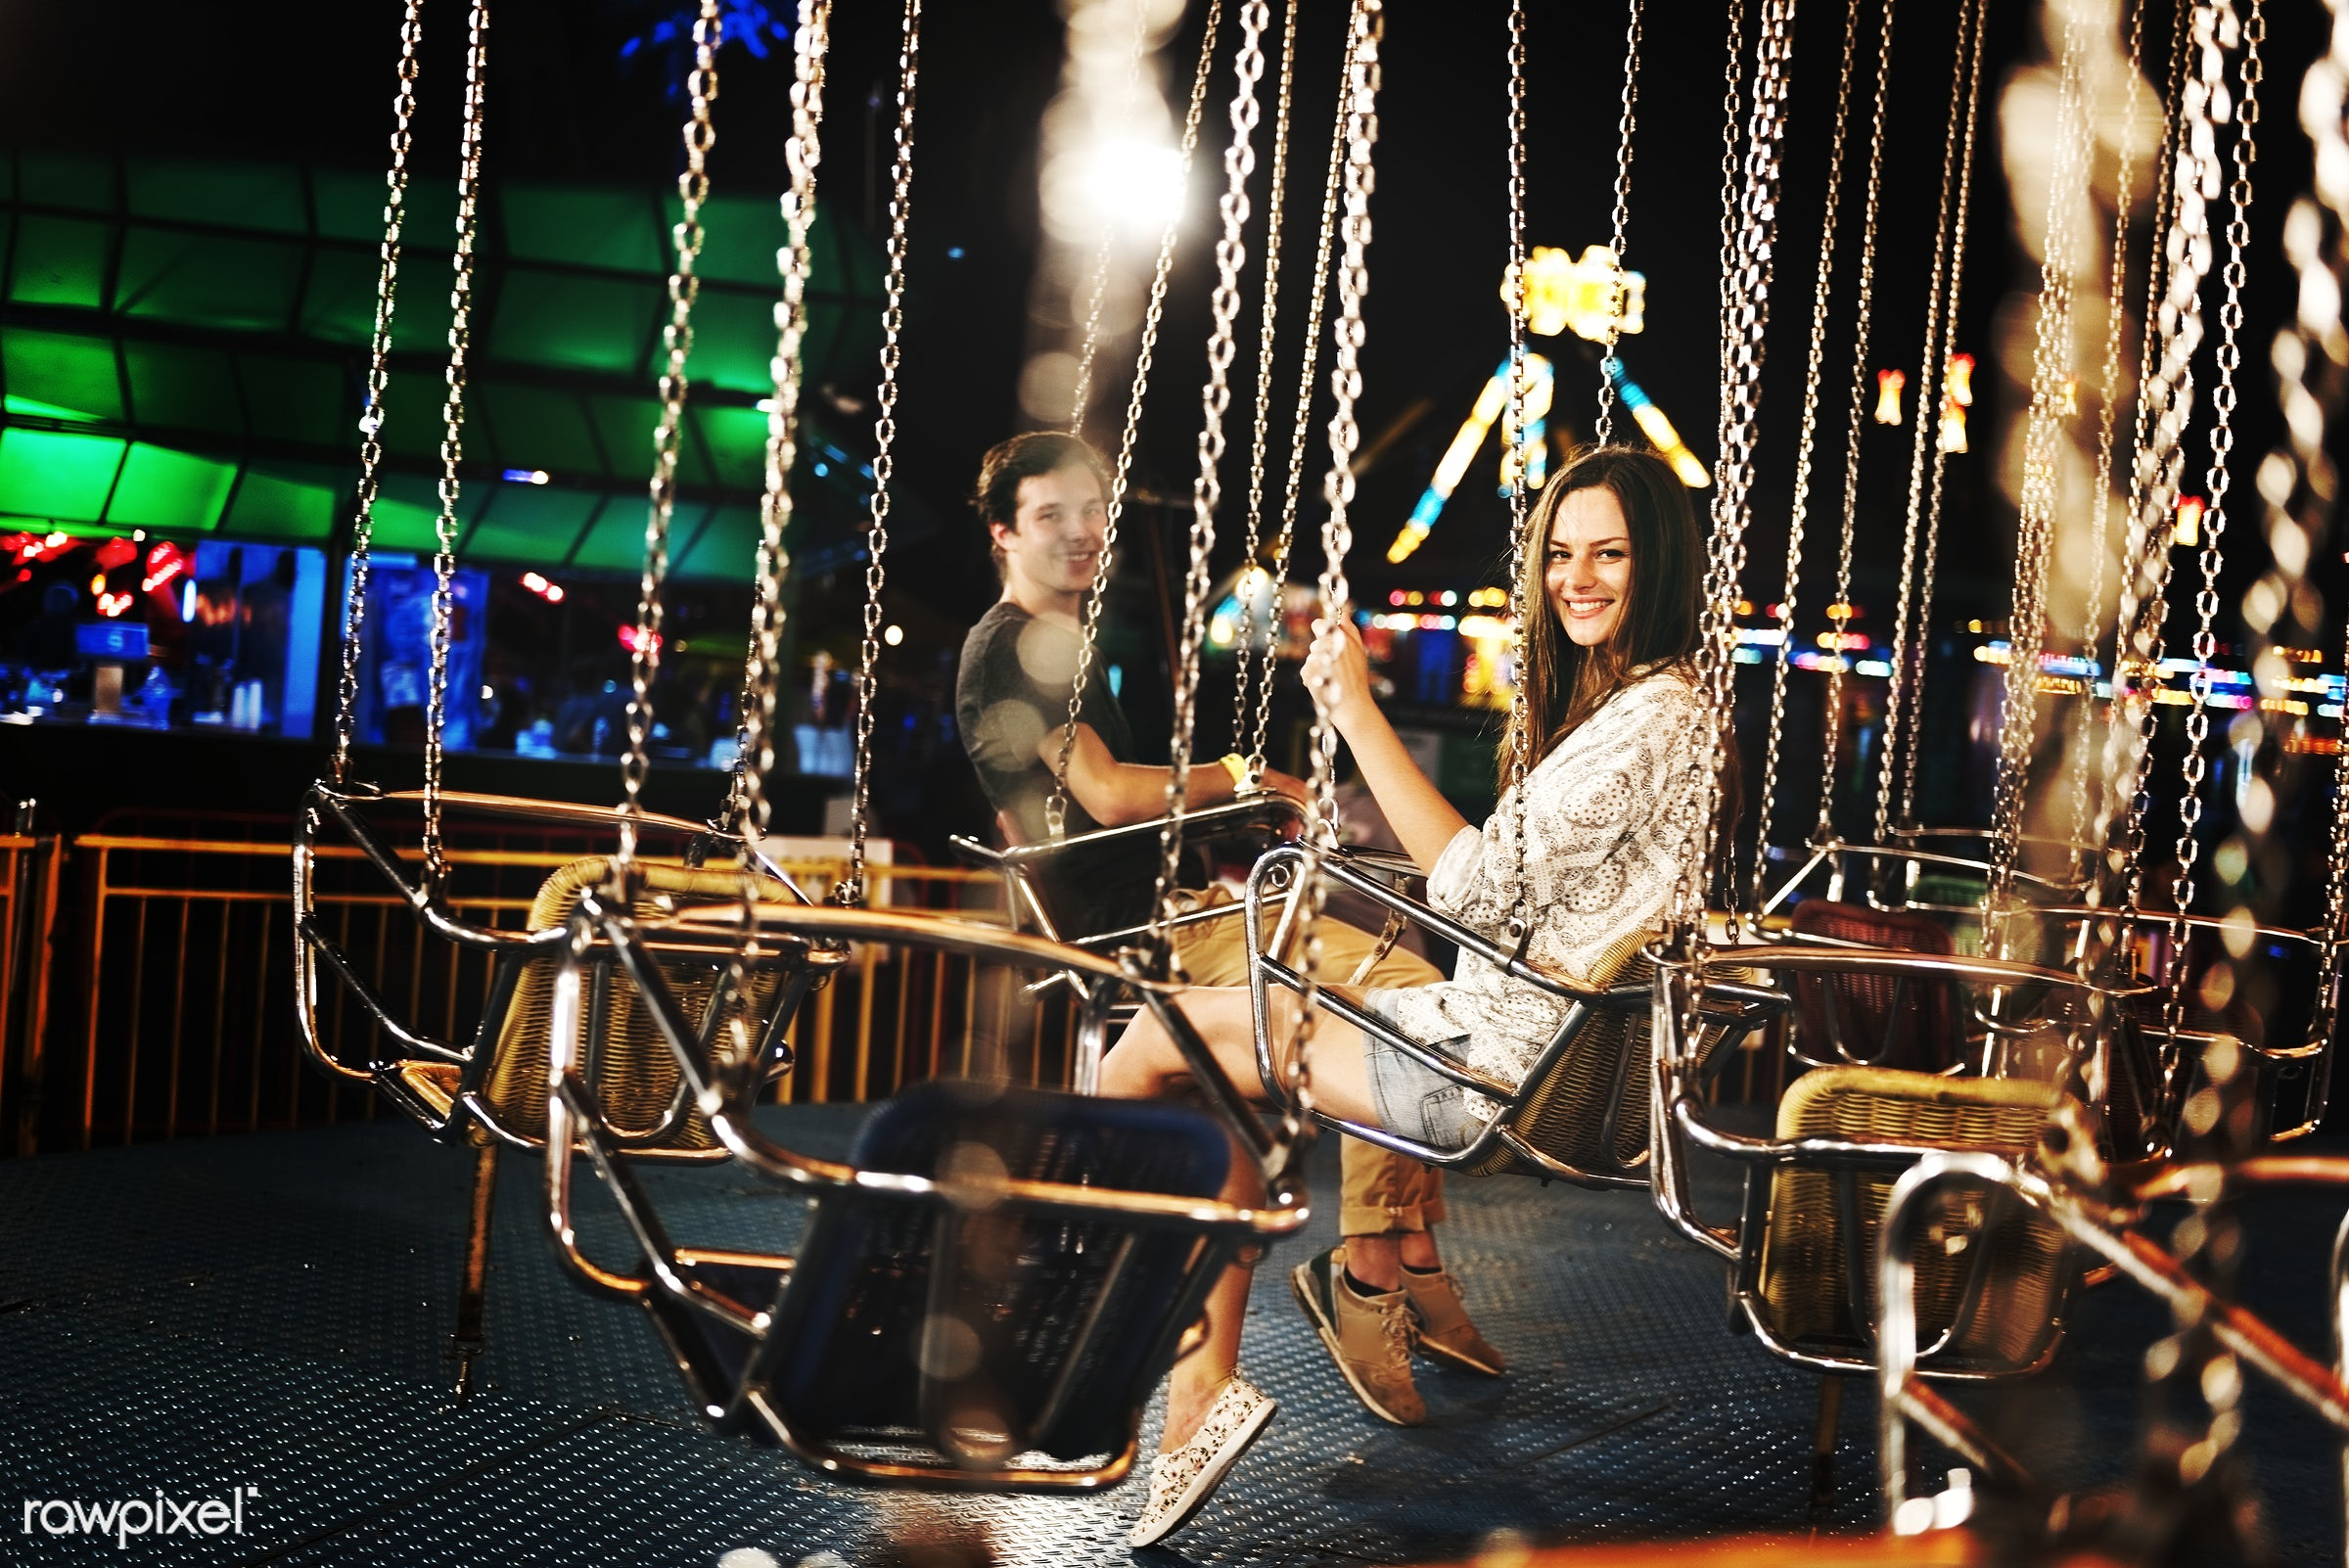 A group of friends is enjoying the amusement park - amusement park, caucasian, enjoyment, expression, feeling, friends,...